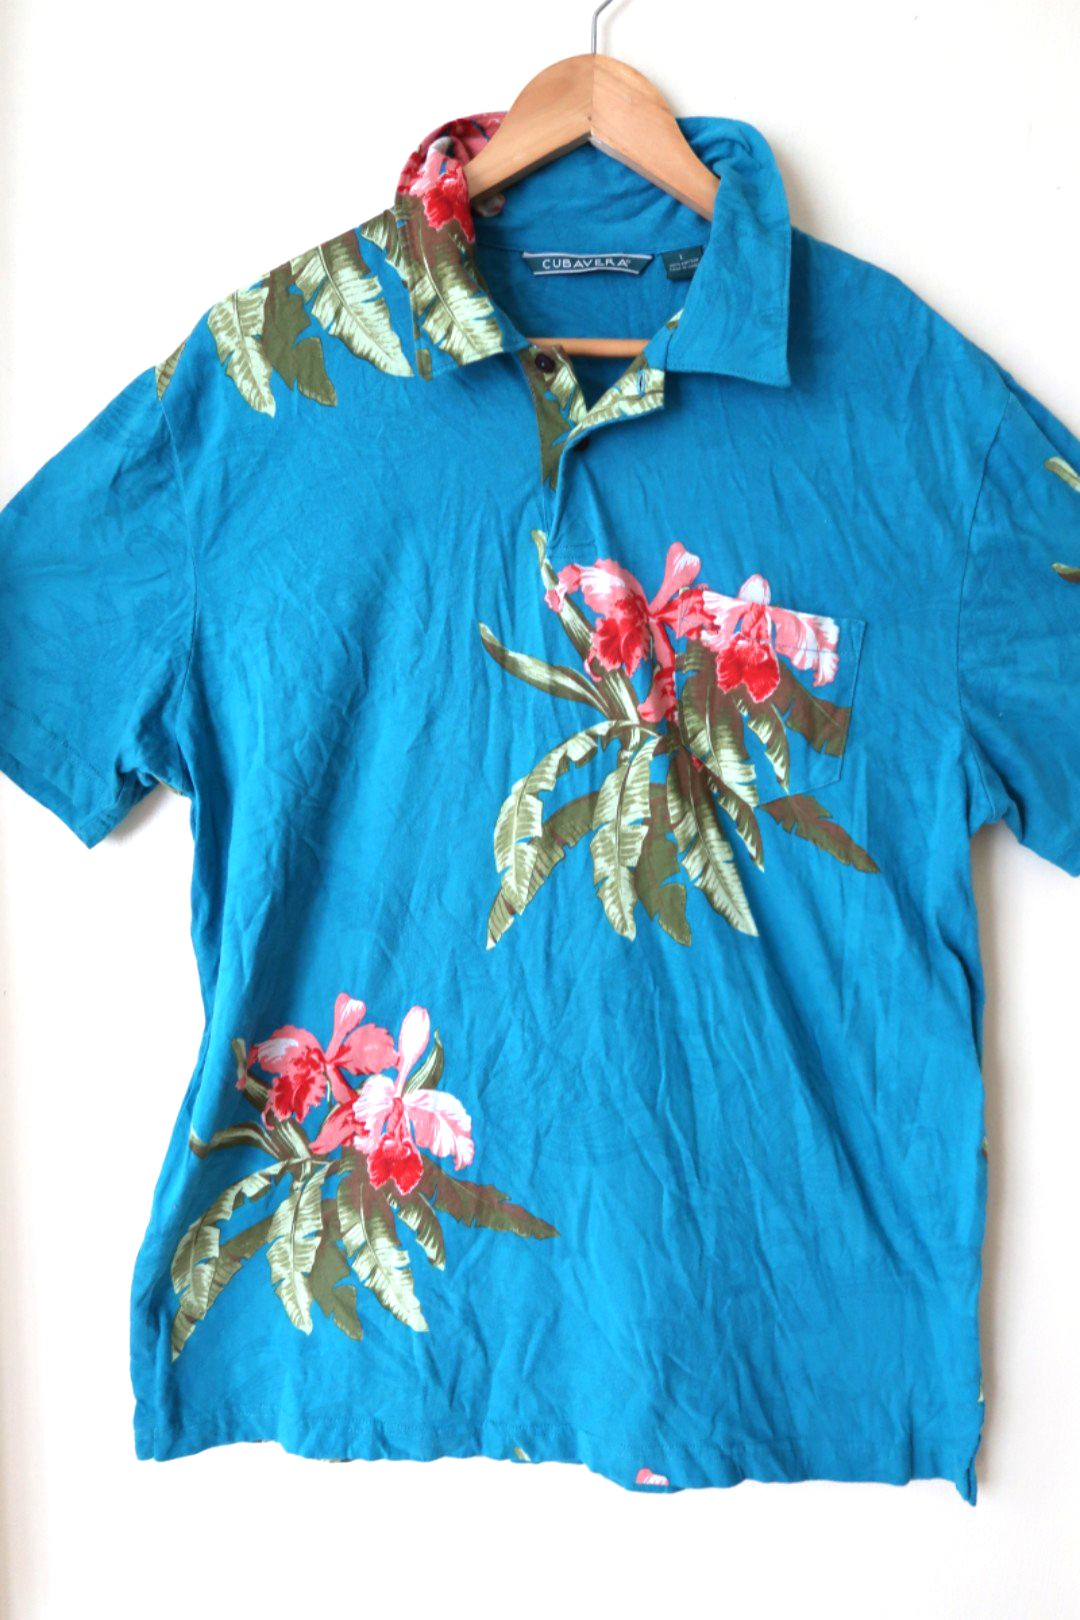 559859e7d Cubavera Polo Shirt, Men's Fashion, Clothes, Tops on Carousell